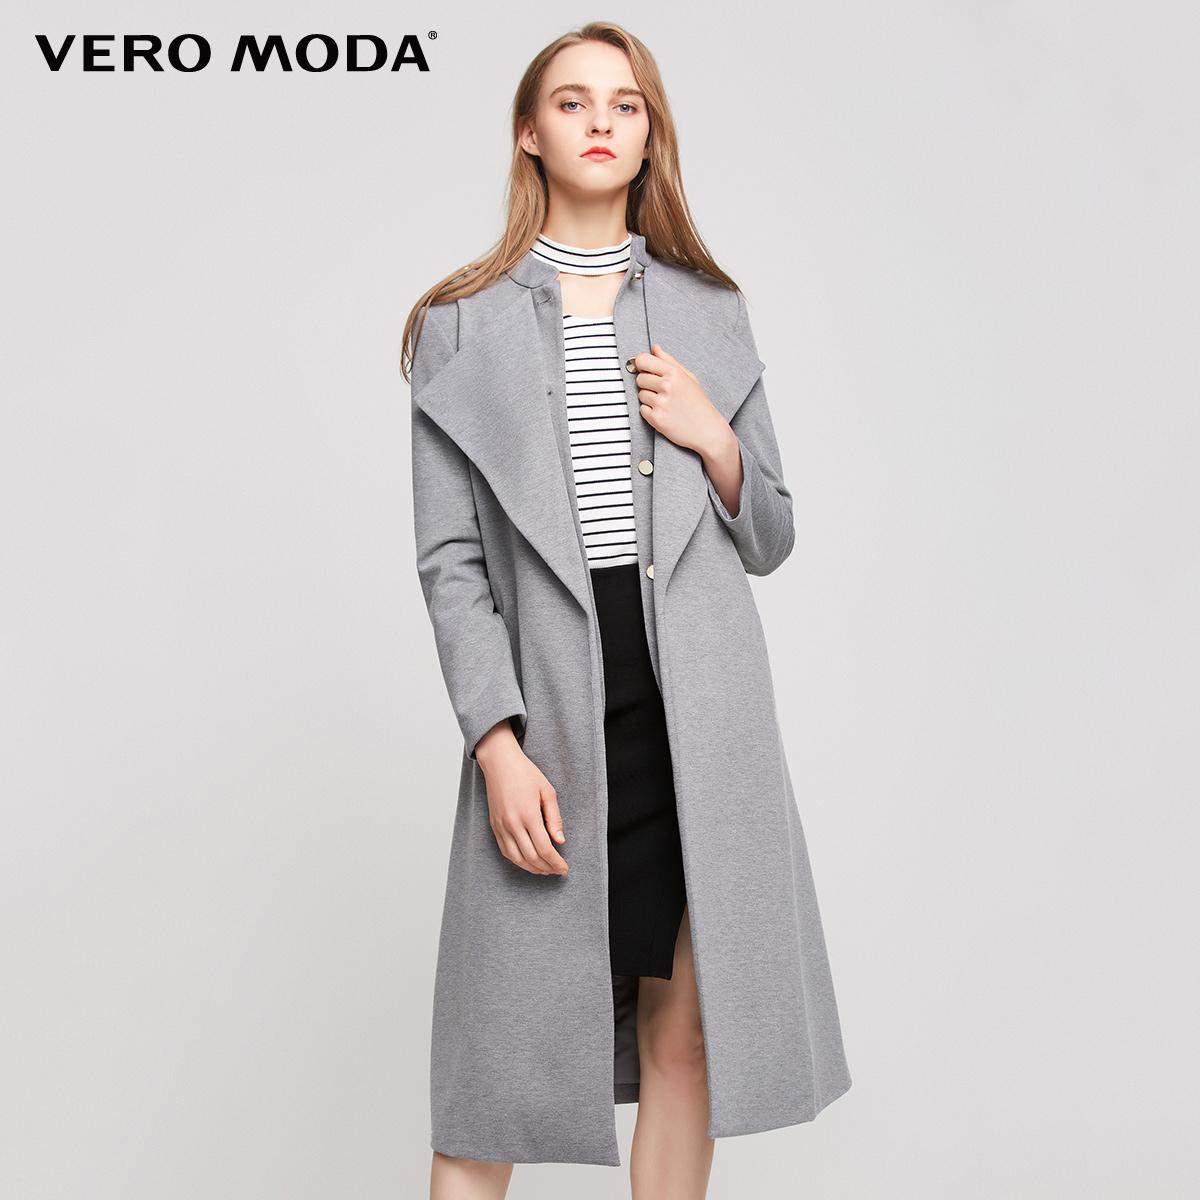 Vero Moda2017秋季新款半高领肩章系带中长款风衣外套|317321506